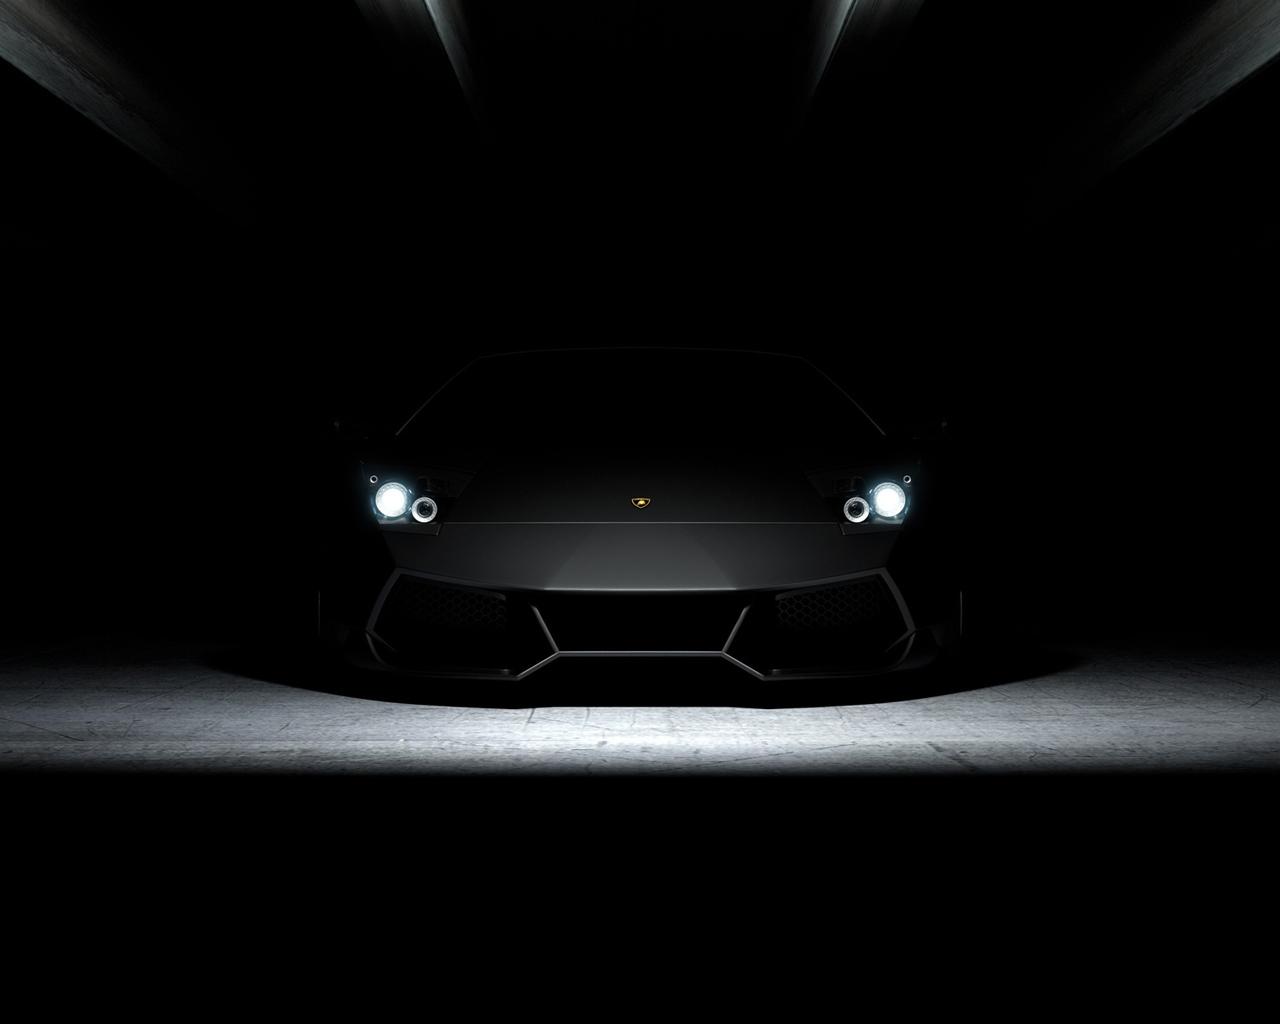 Обои Lamborghini, Облака, красиво, темный фон. Автомобили foto 17